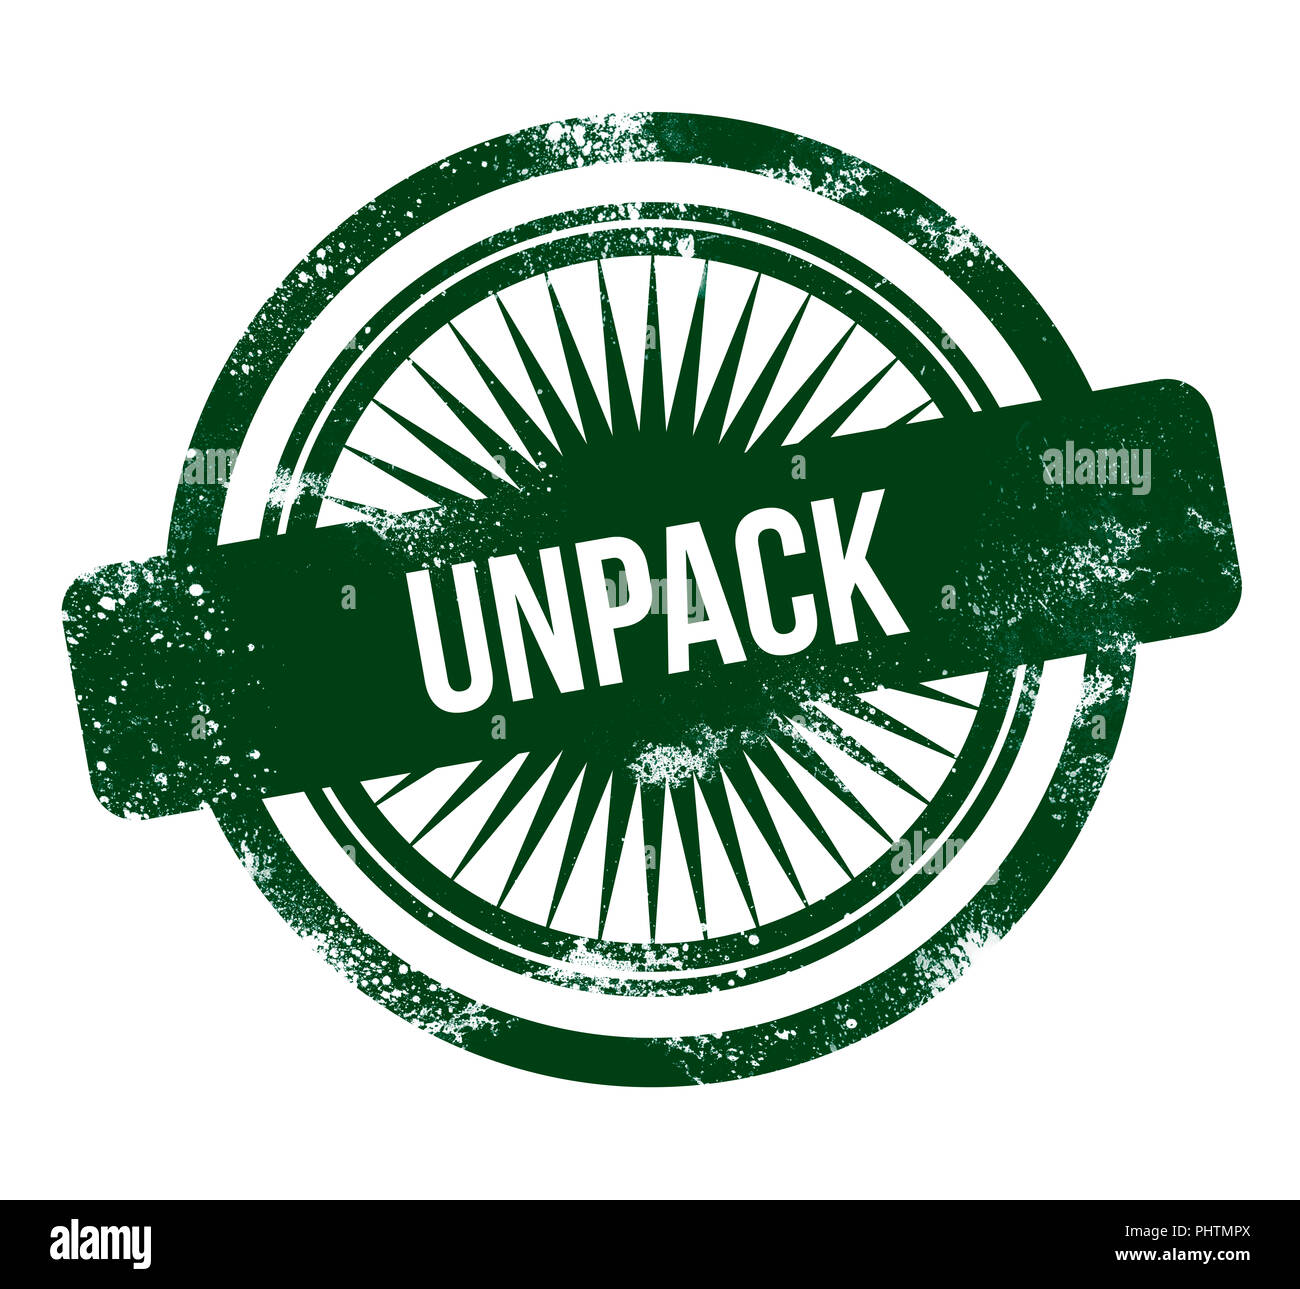 Unpack - green grunge stamp Photo Stock